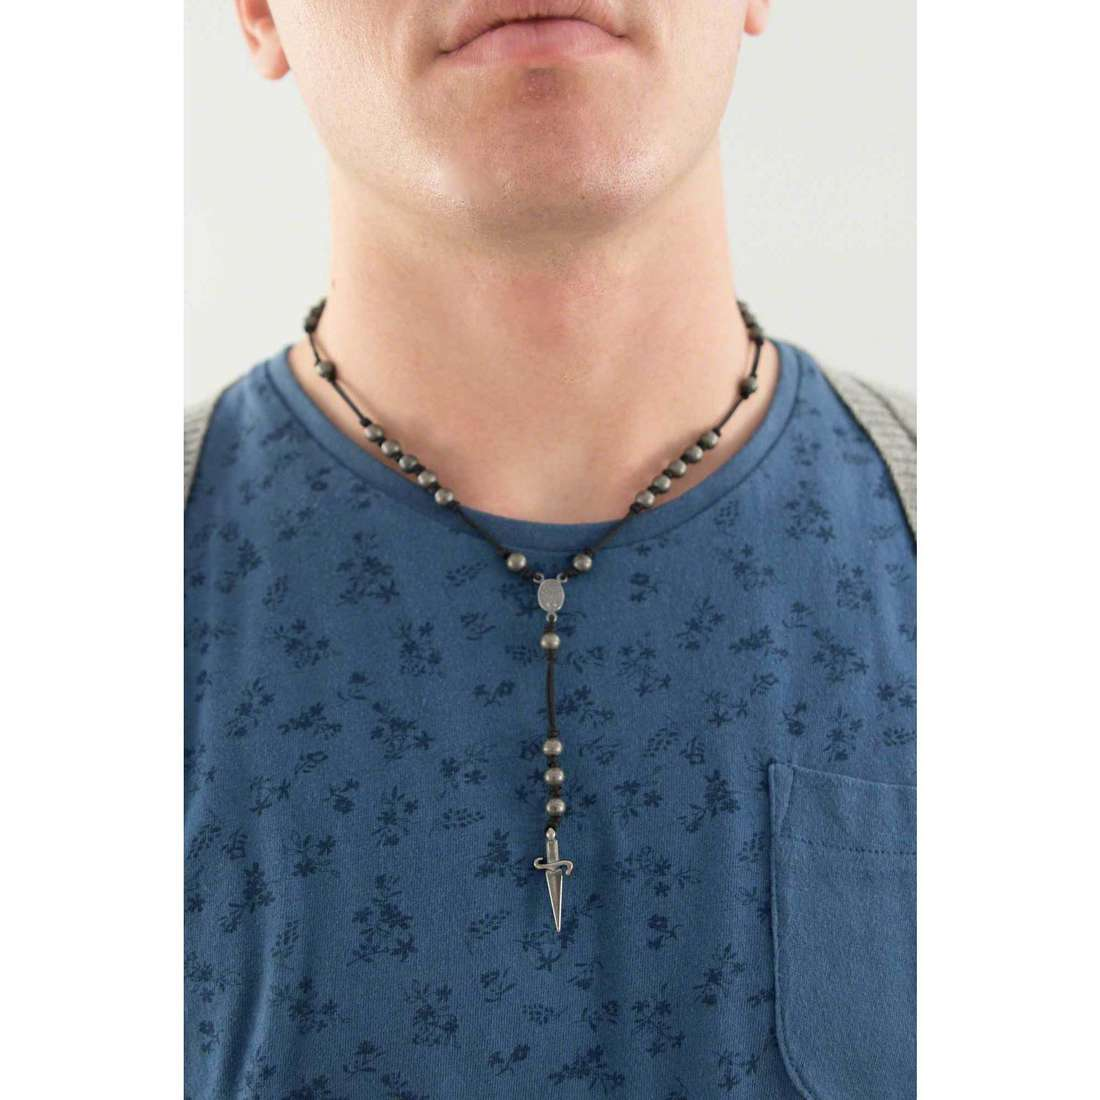 Cesare Paciotti necklaces man JPCL1051V indosso